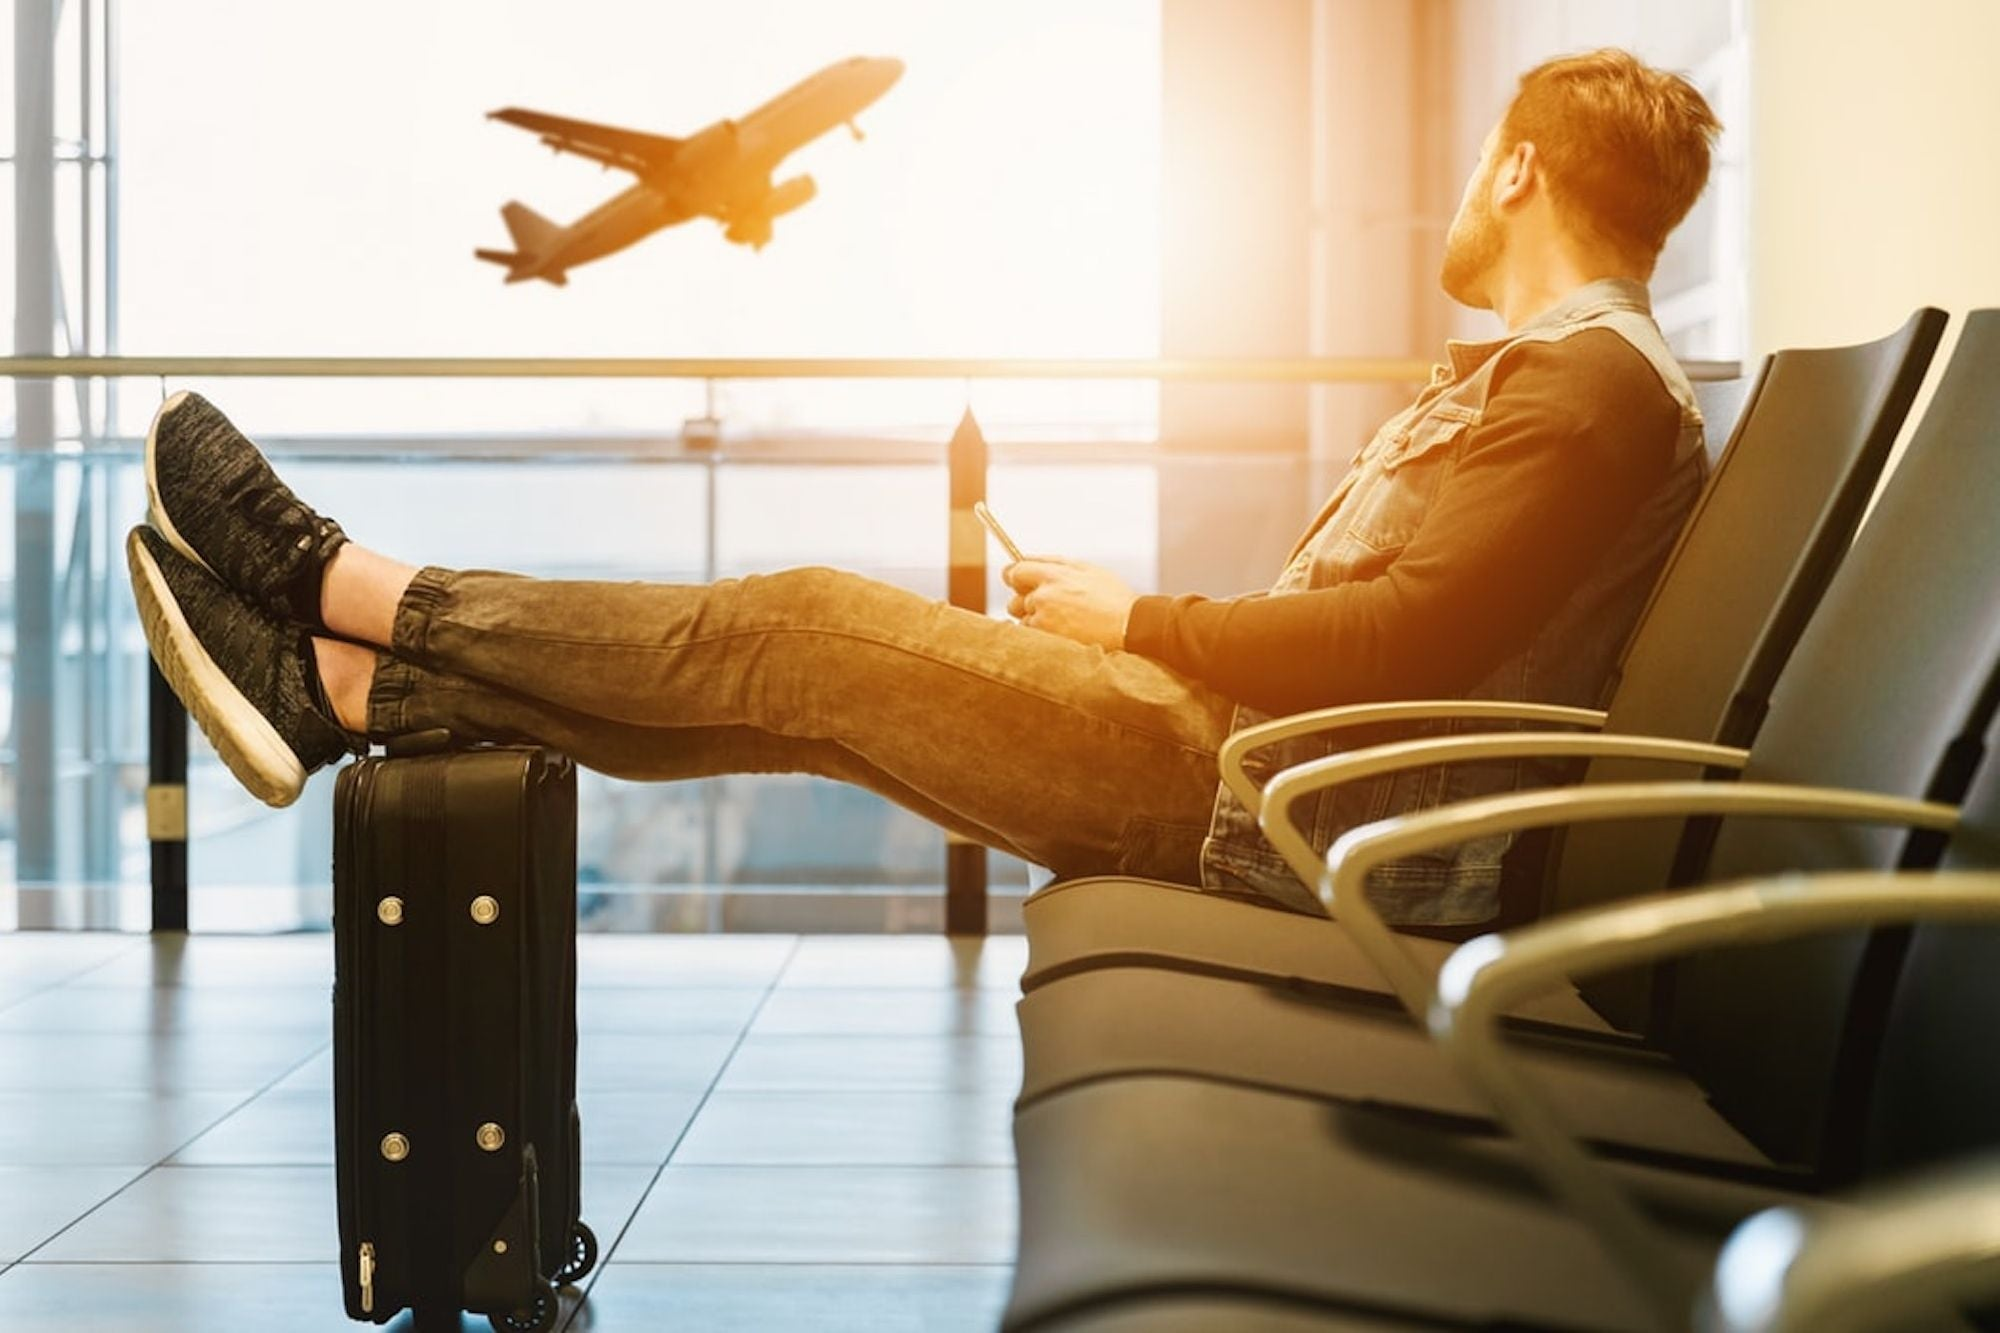 Black Friday Deals for the Traveling Entrepreneur